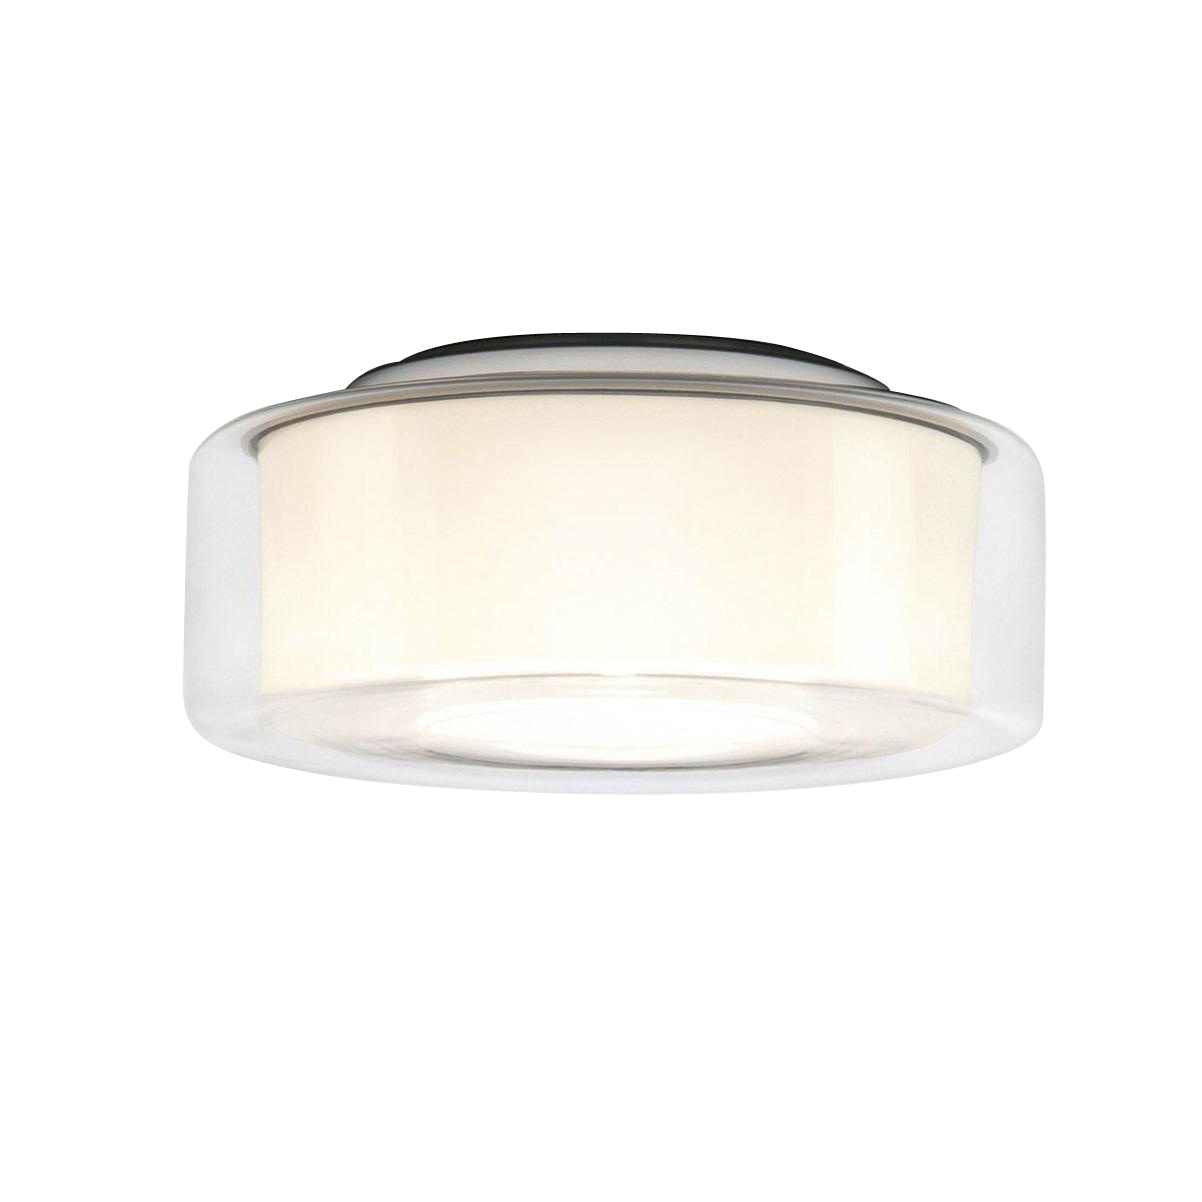 zylindriØ17 5cm740lm Deckenleuchte transparentopal Reflektor Curling HALO Ceiling Serien QdxoBthrsC